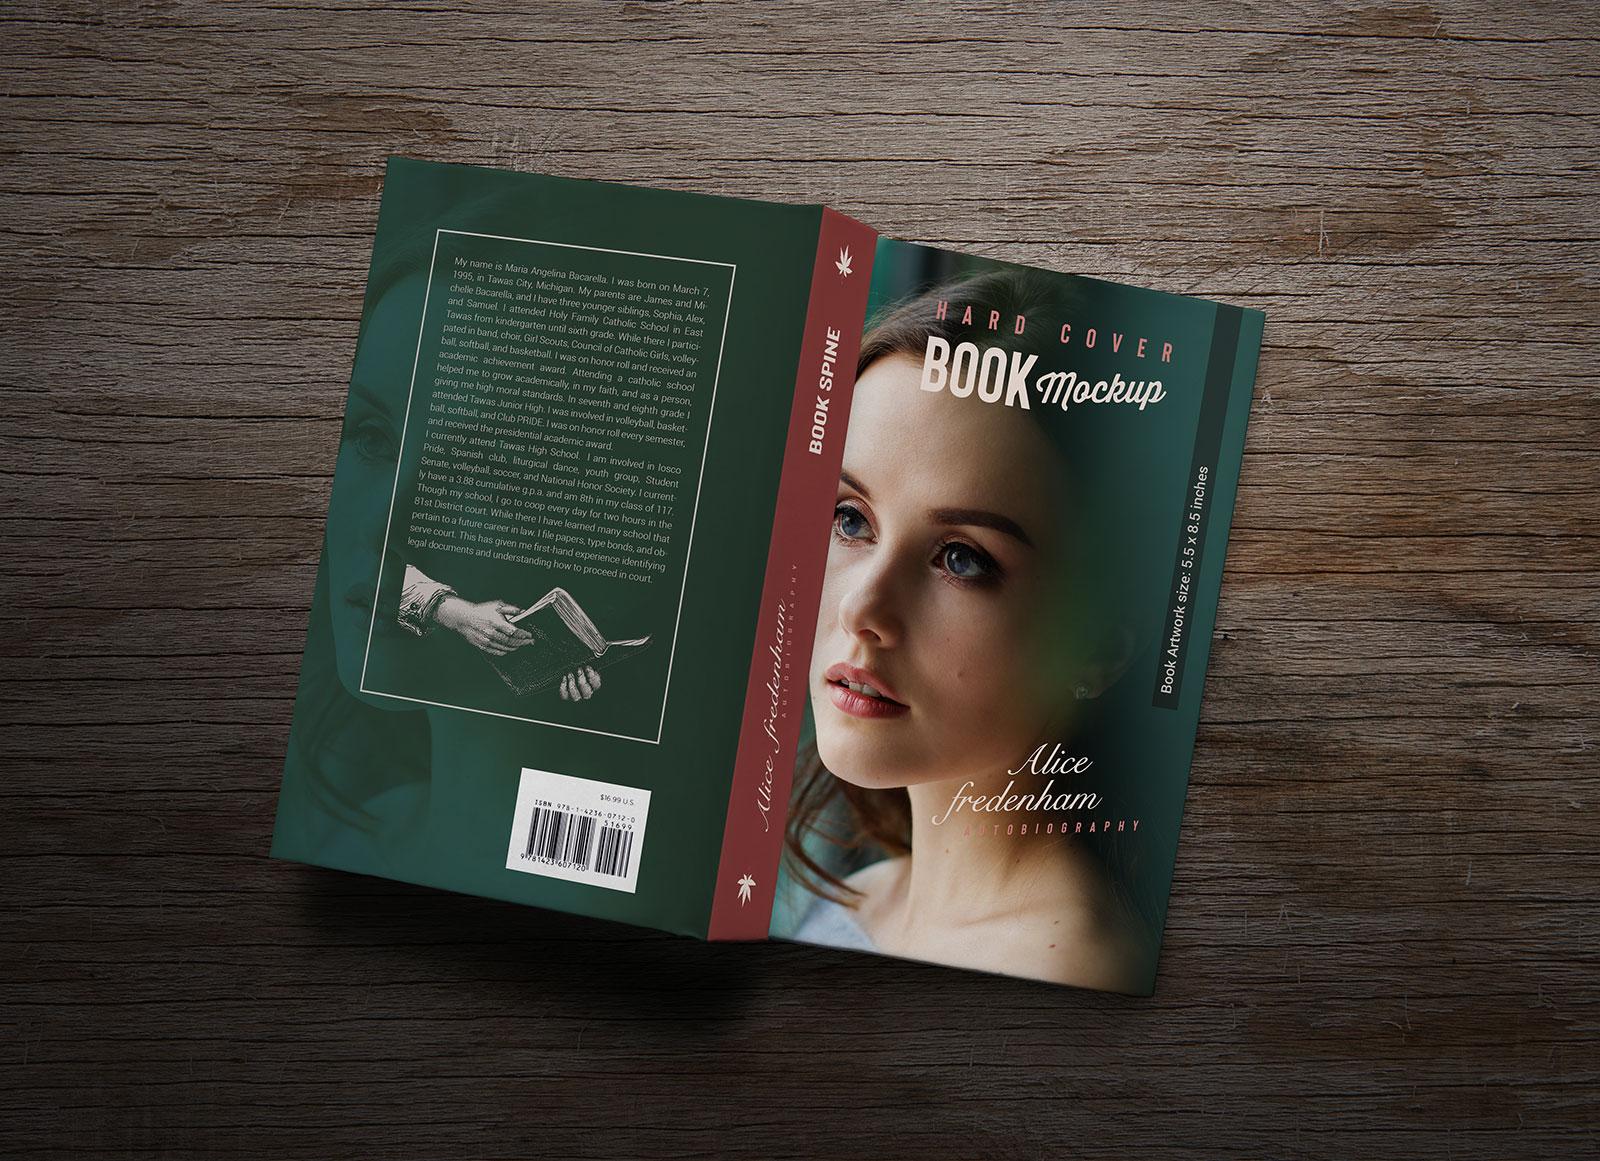 Free-Opened-Fat-Book-Mockup-PSD